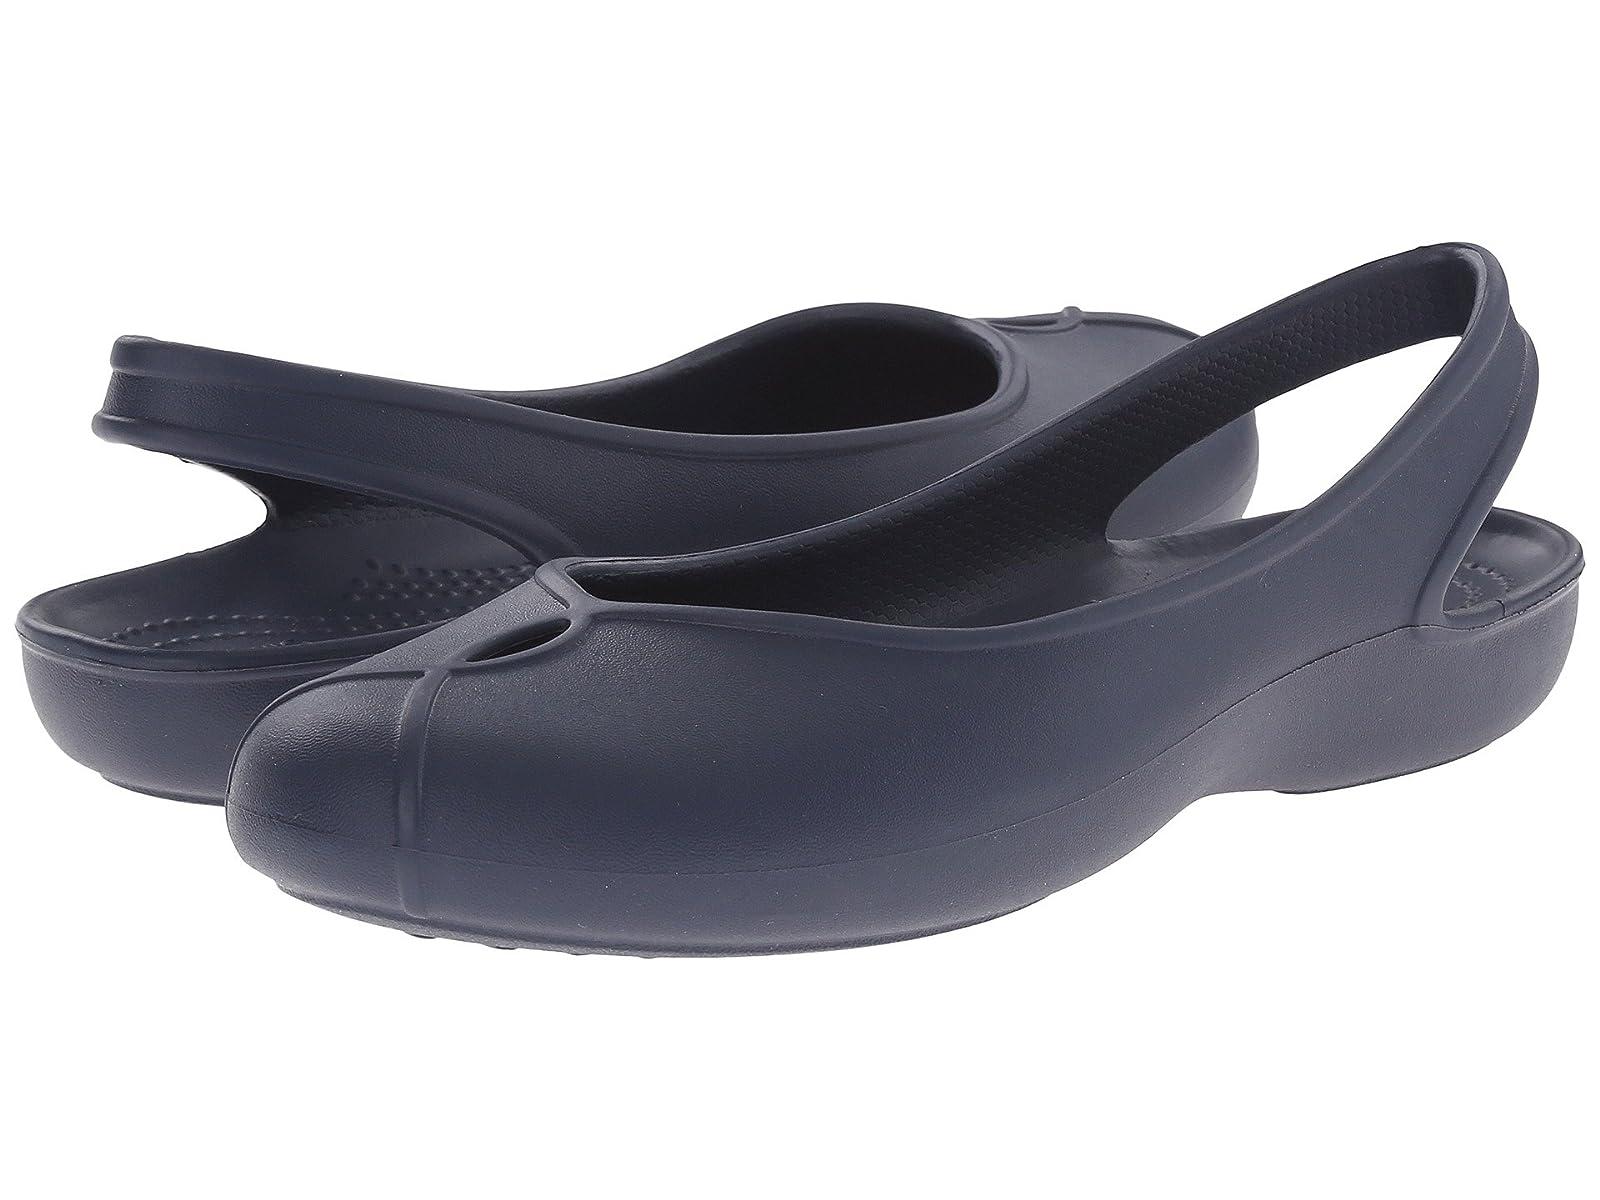 Crocs Shopping:Gentleman/Lady Olivia II Flat :Online Shopping:Gentleman/Lady Crocs bd85c5